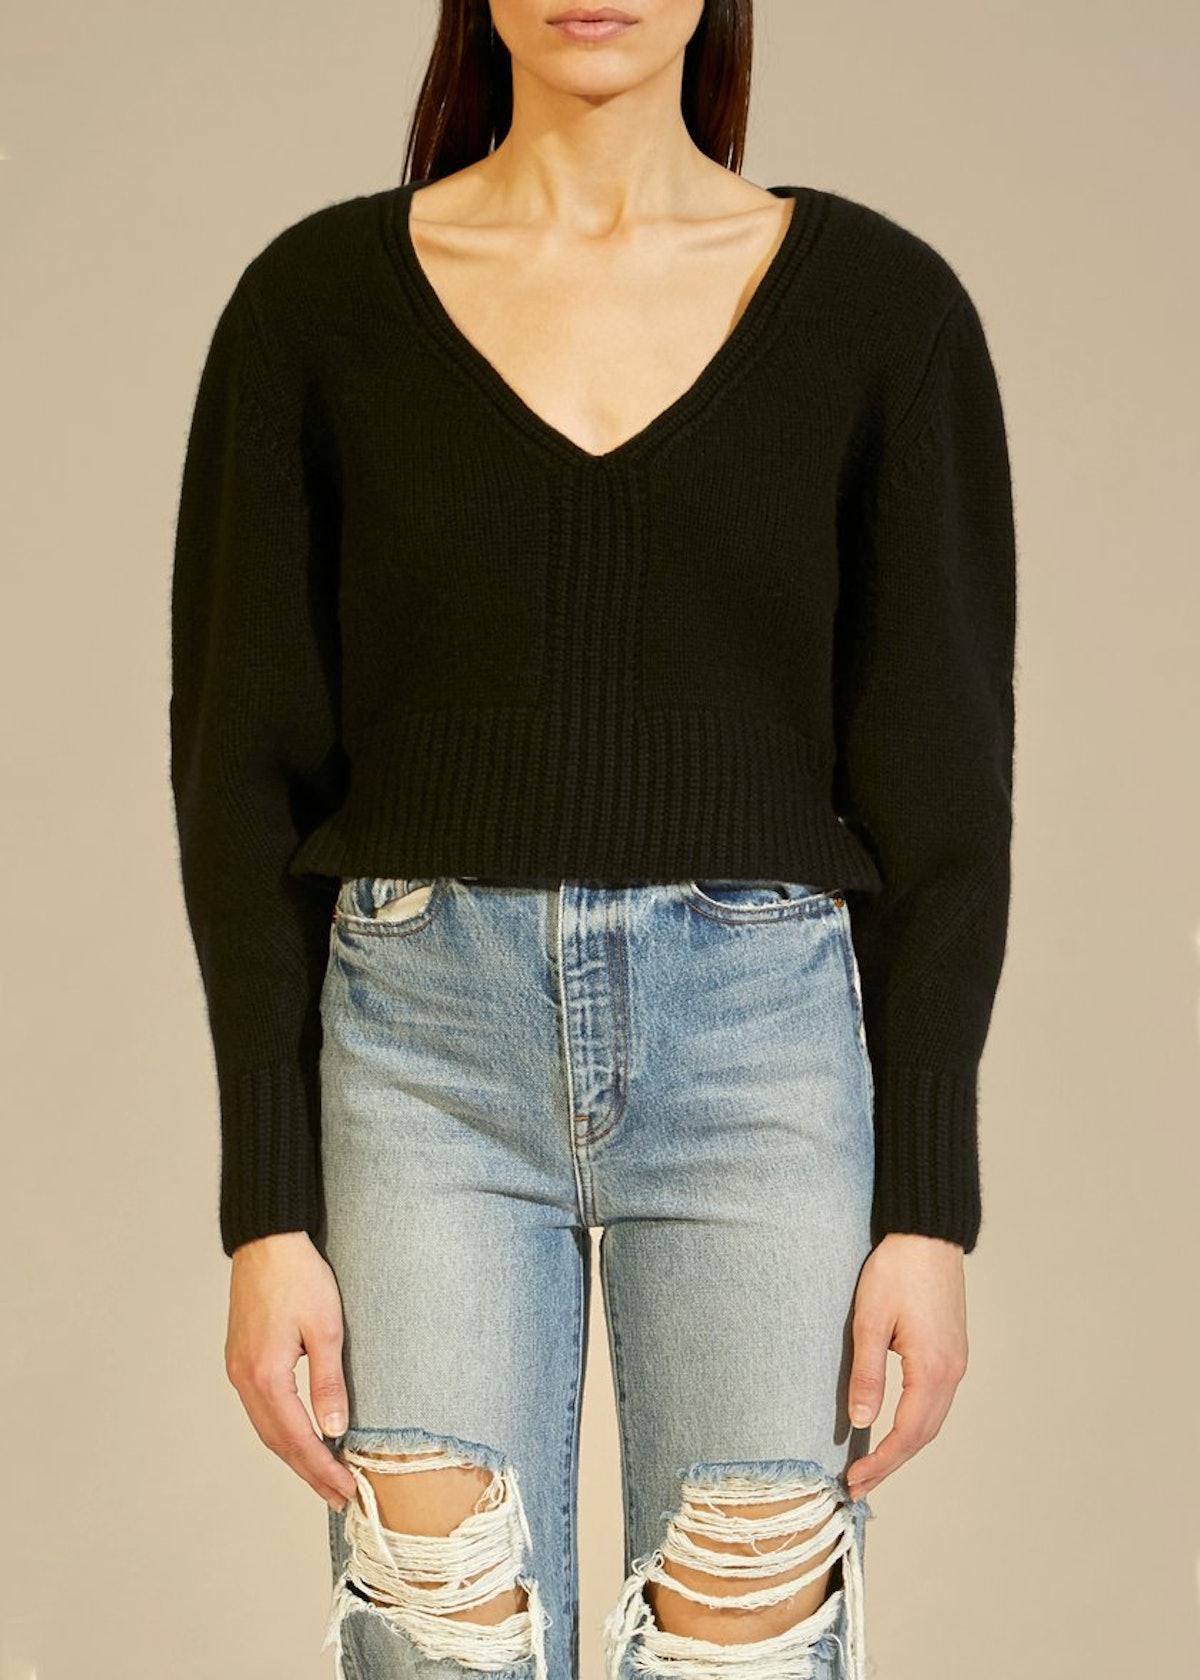 Charlette Sweater In Black